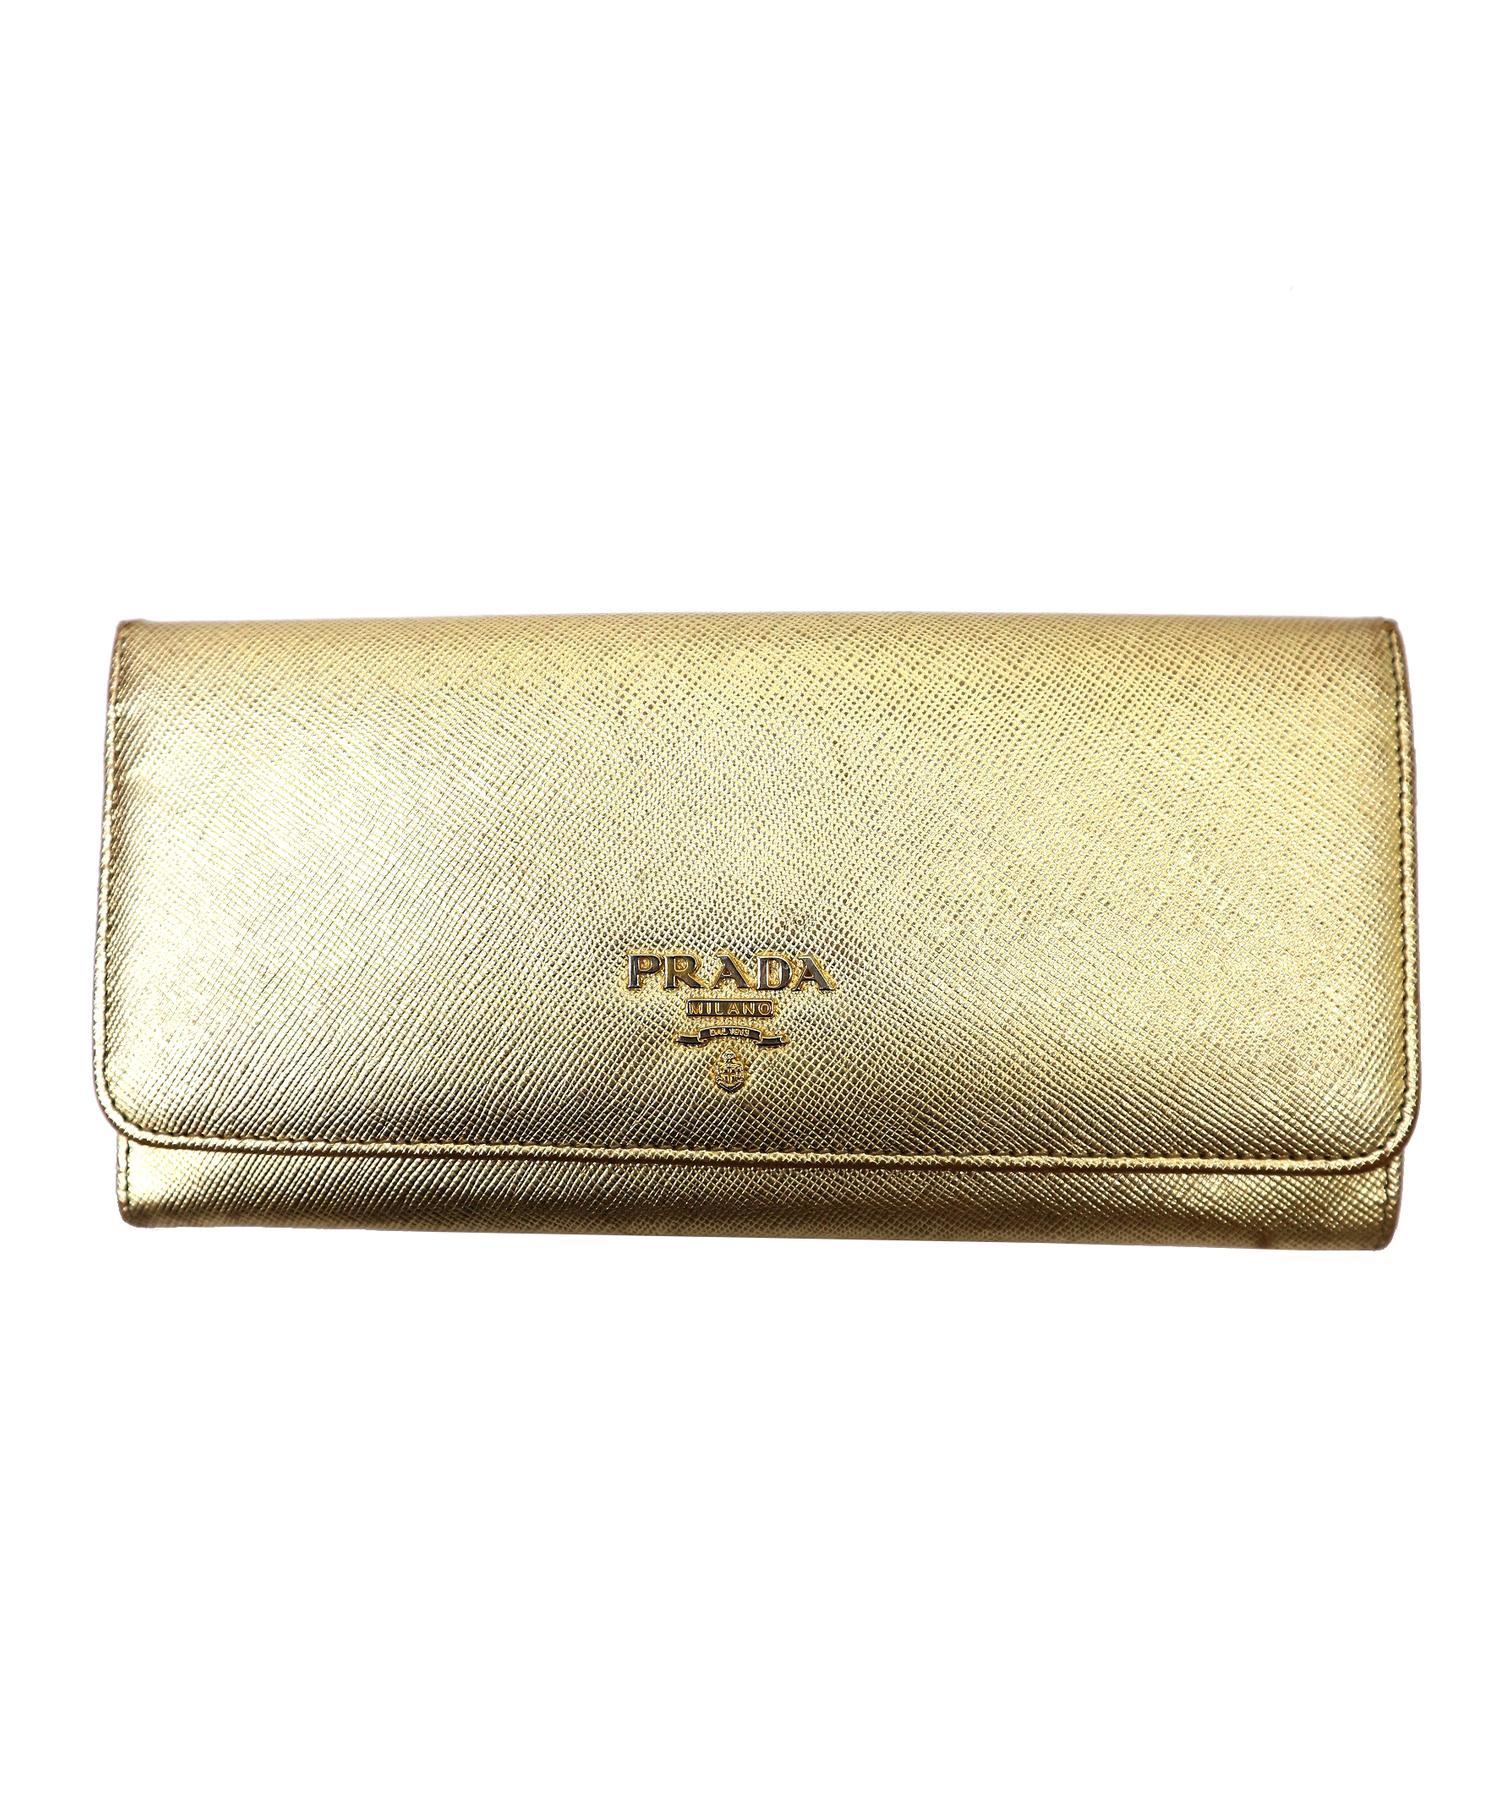 new product aa548 68783 [中古]PRADA(プラダ)のレディース 服飾小物 財布